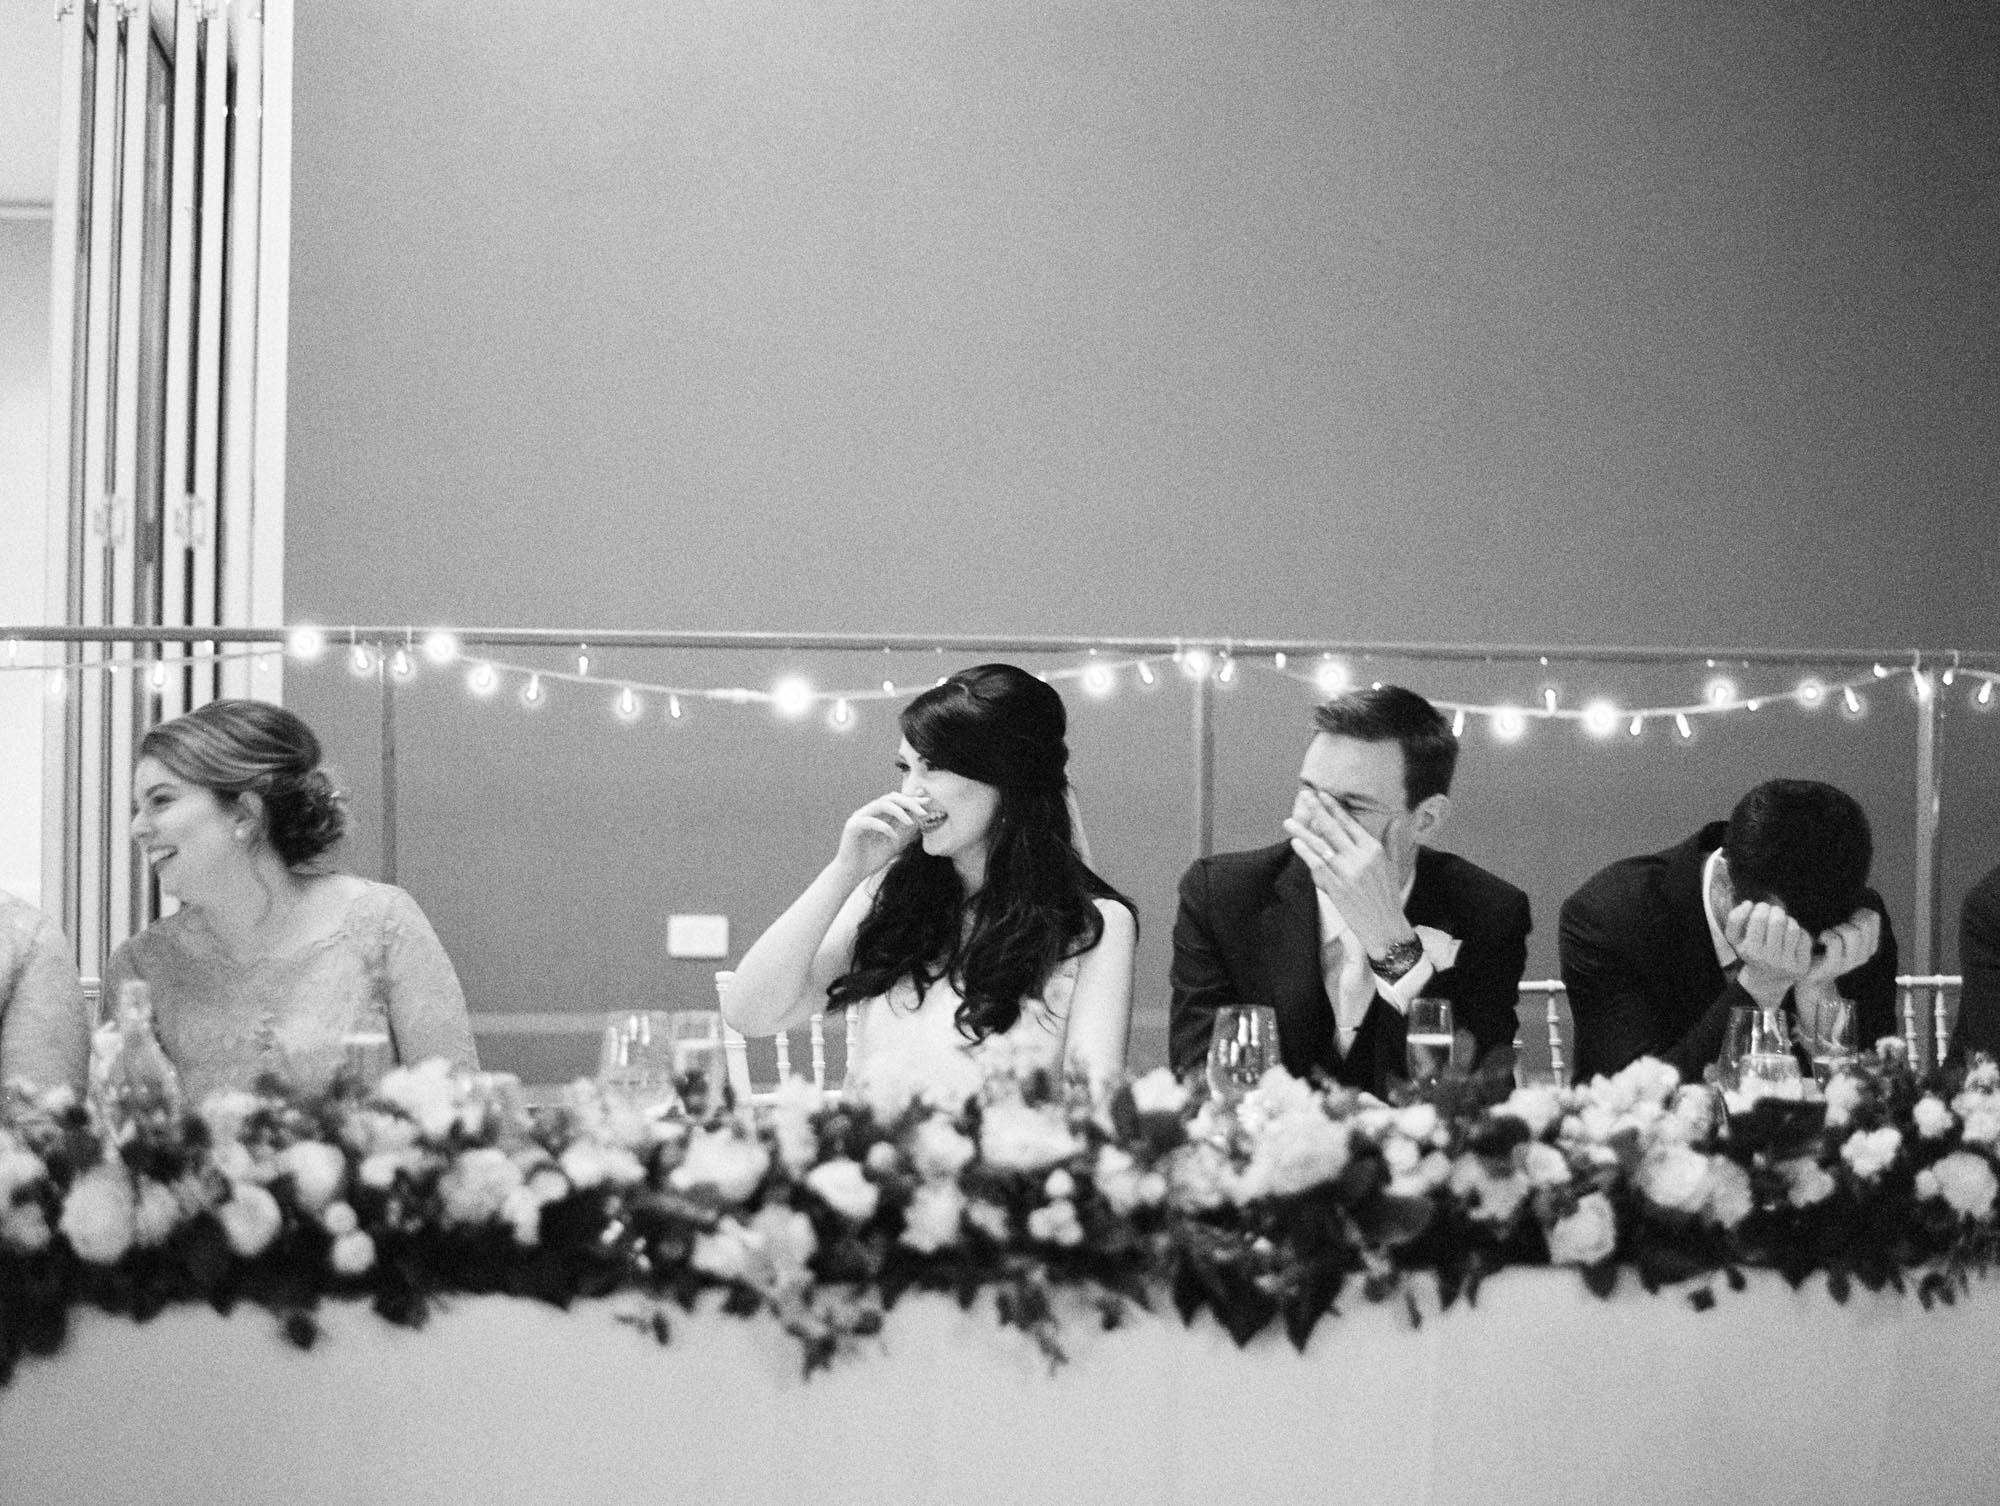 Glen-Ewin-Estate-wedding-photography-091.jpg